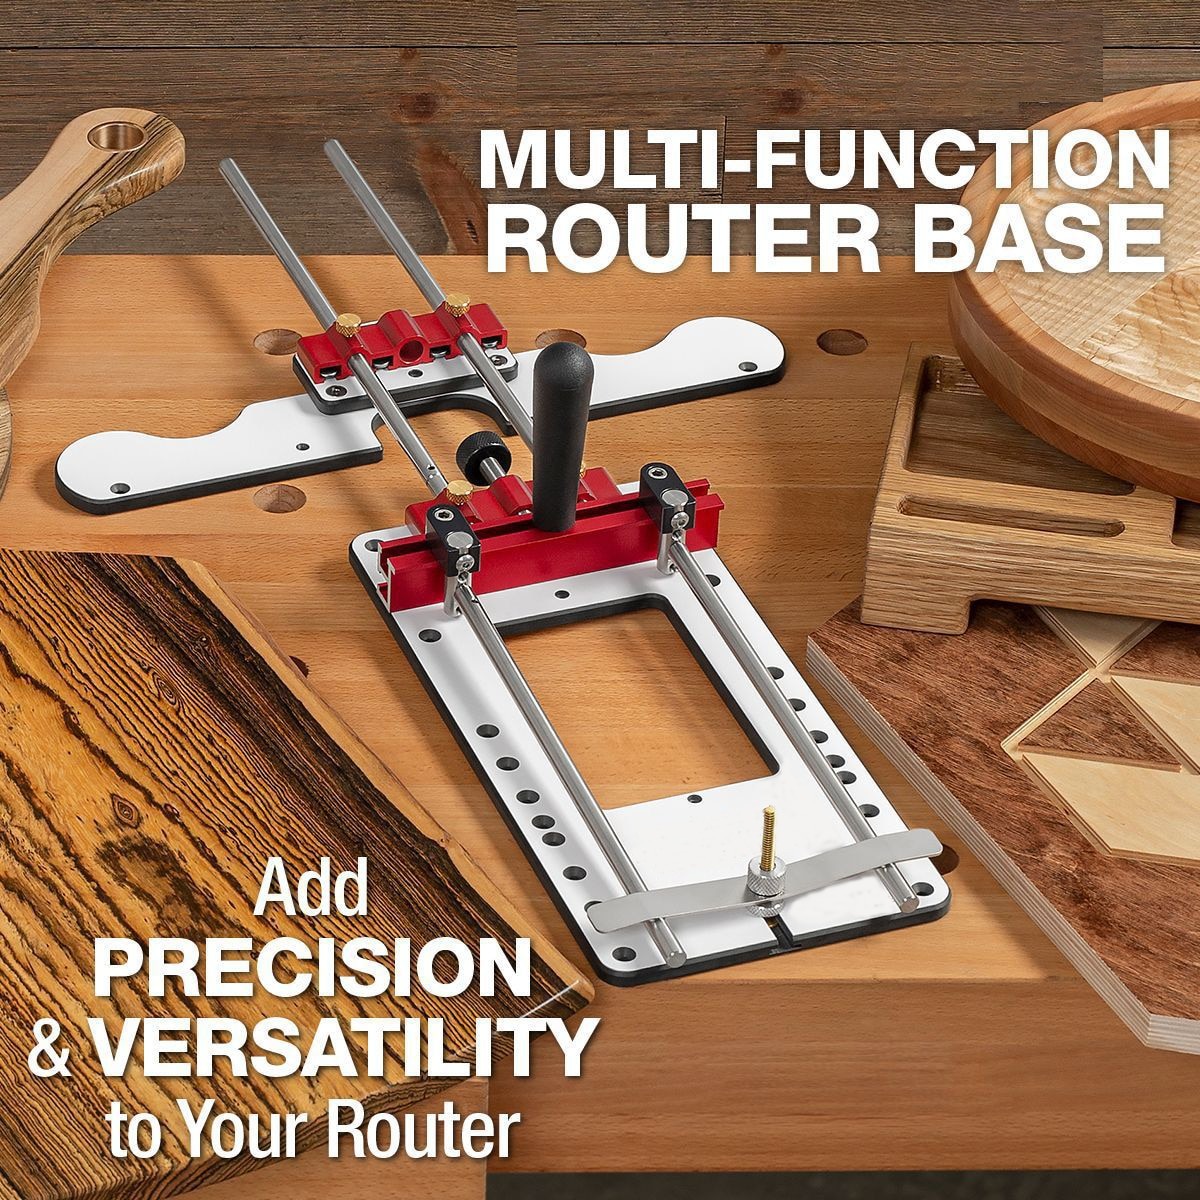 New Woodworking Locator Engraving Machine Locator Adjustable Punching Locator Drilling Template Mini Desktop Woodworking Tool